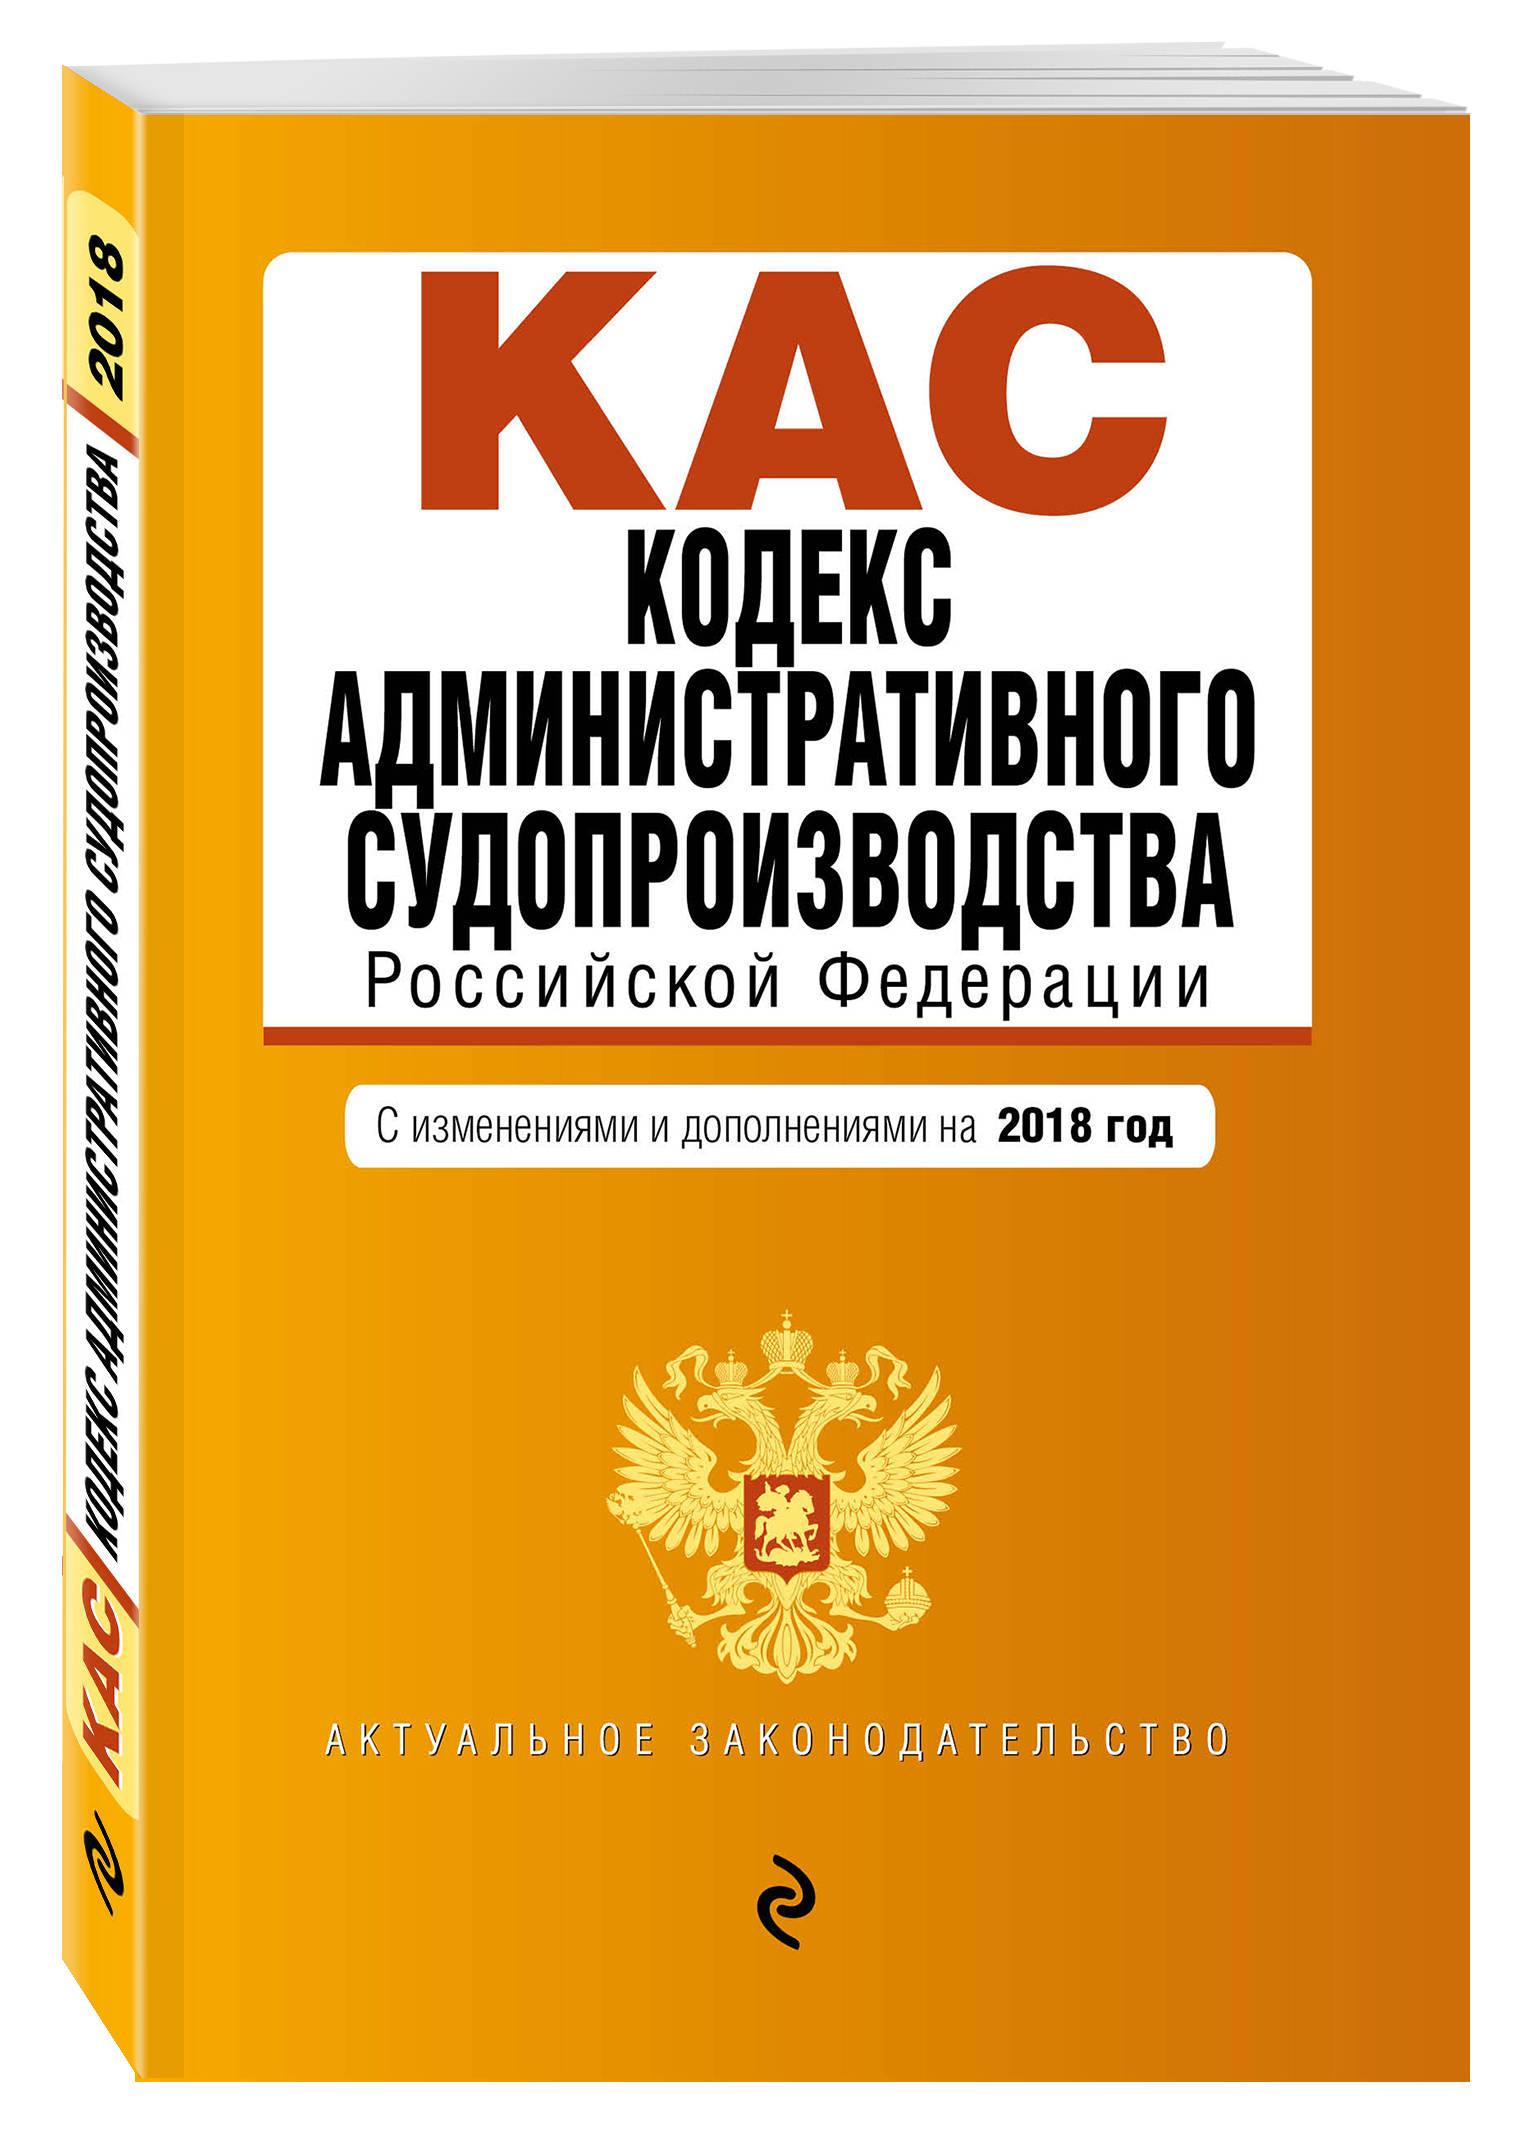 Кодекс административного судопроизводства РФ: с изм. и доп. на 2018 г. кодекс административного судопроизводства рф с изменениями на 2018 год